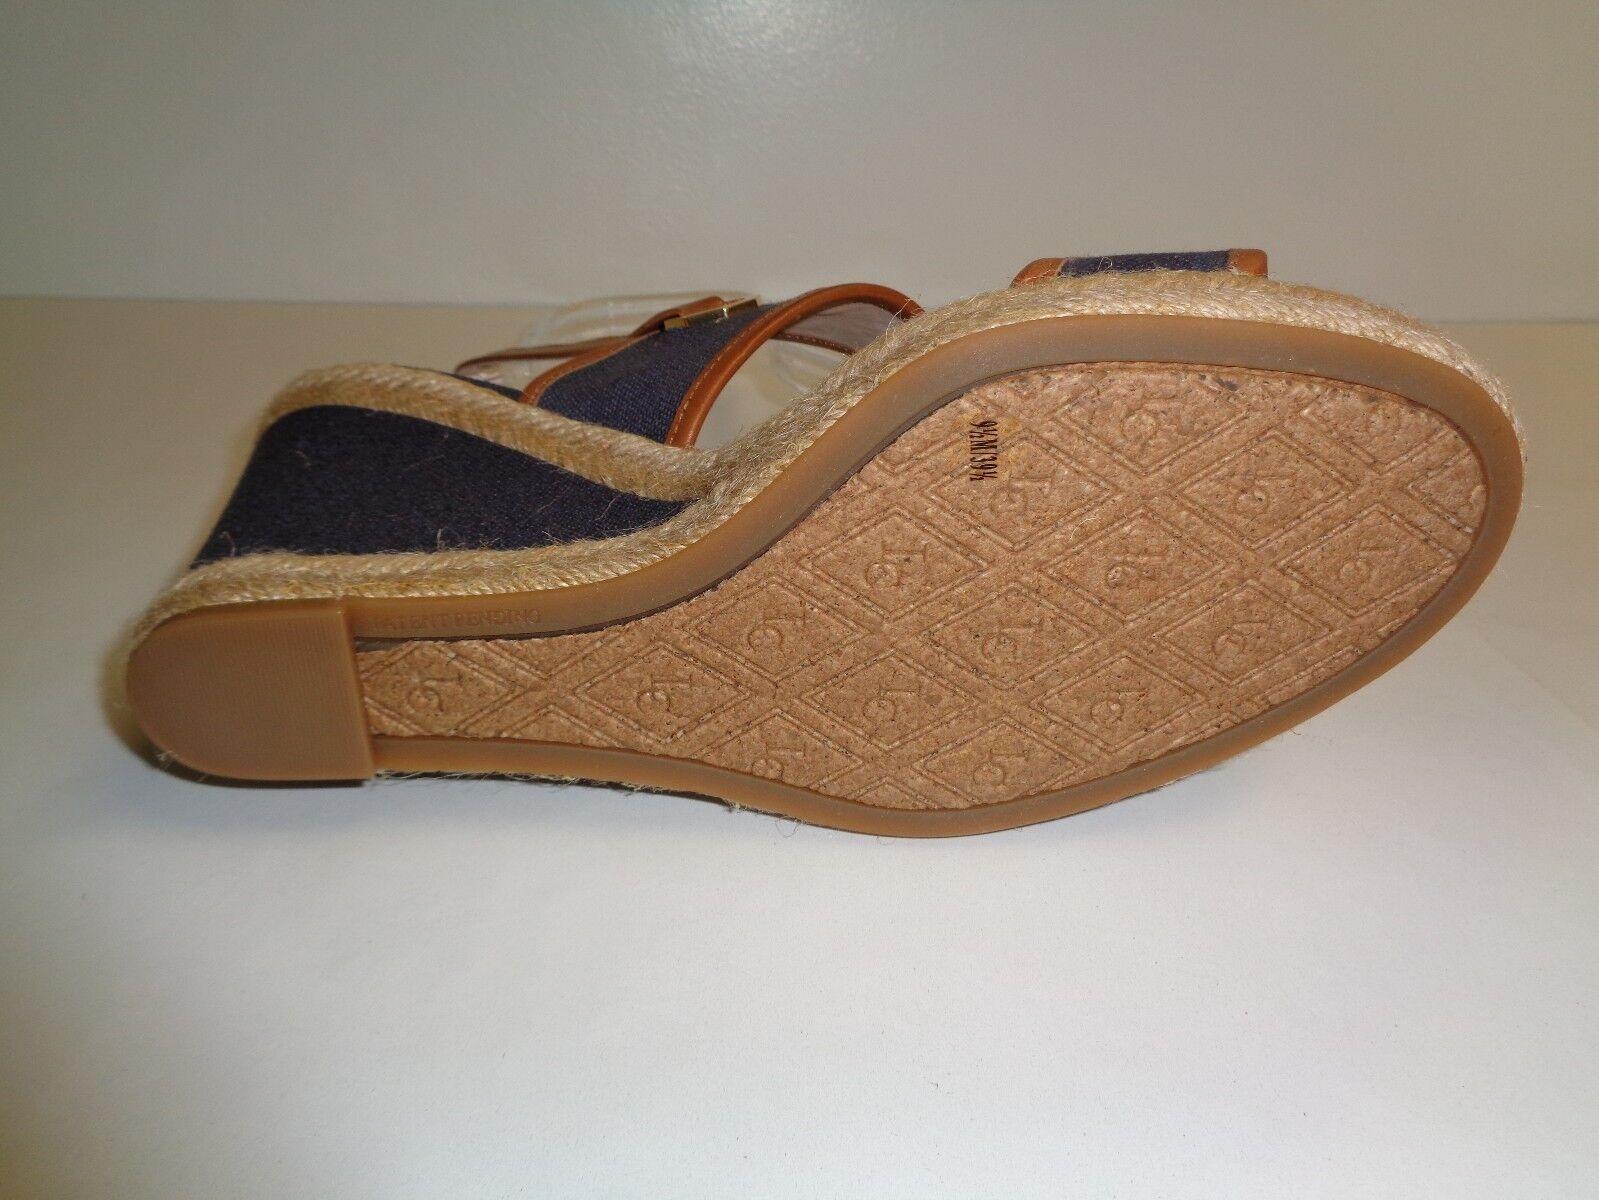 b696c60c59c4 ... Louise et Cie Taille 9.5 9.5 9.5 M REBEKAH Navy Leather Fabric Sandals  New femmes chaussures ...